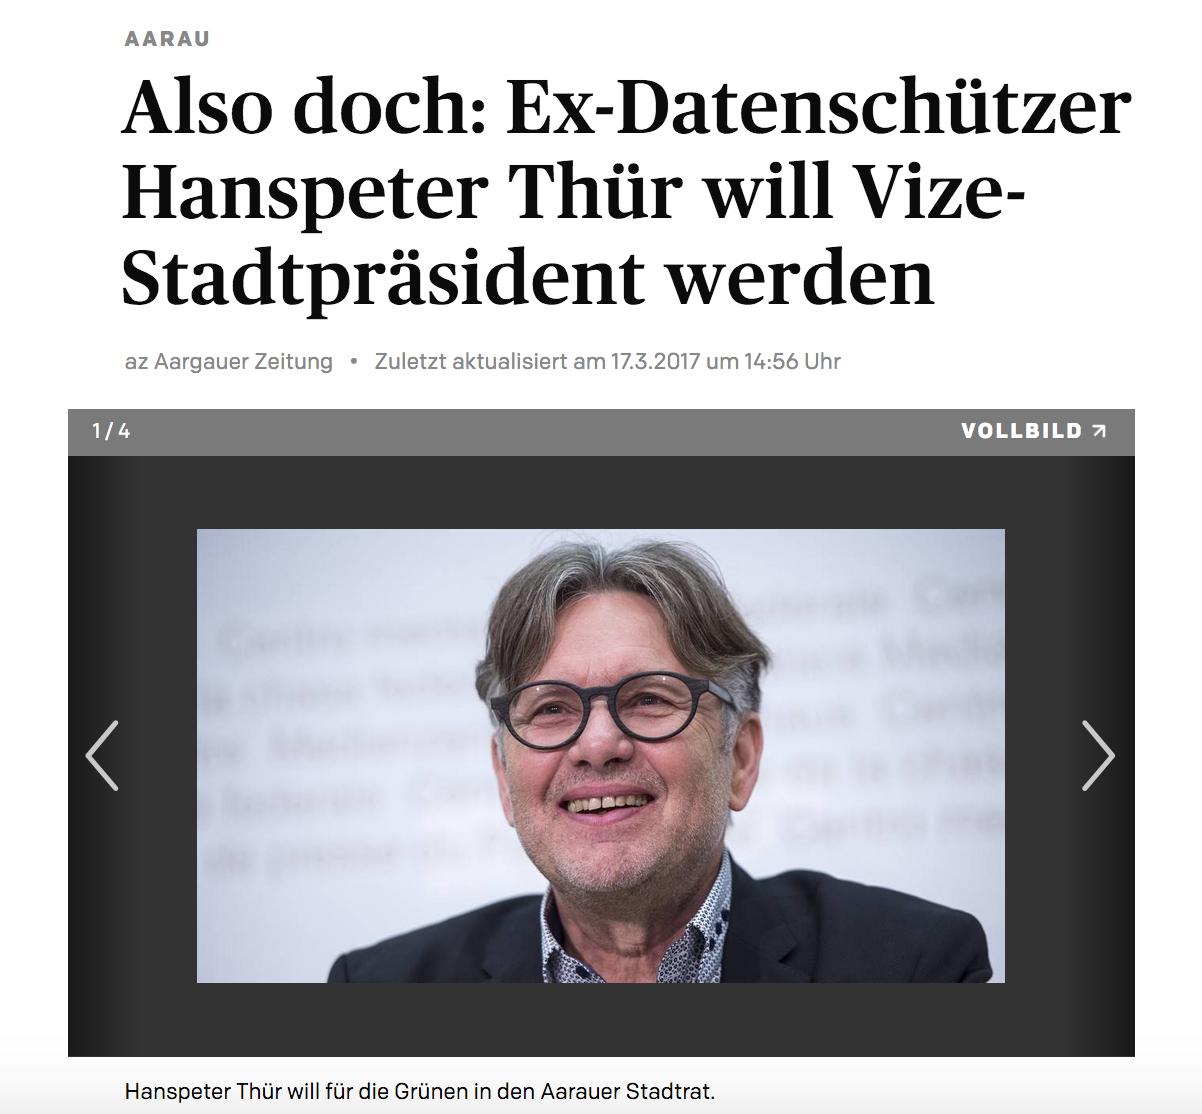 Also doch: Ex-Datenschützer Hanspeter Thür will Vize-Stadtpräsident werden - Hanspeter Thür